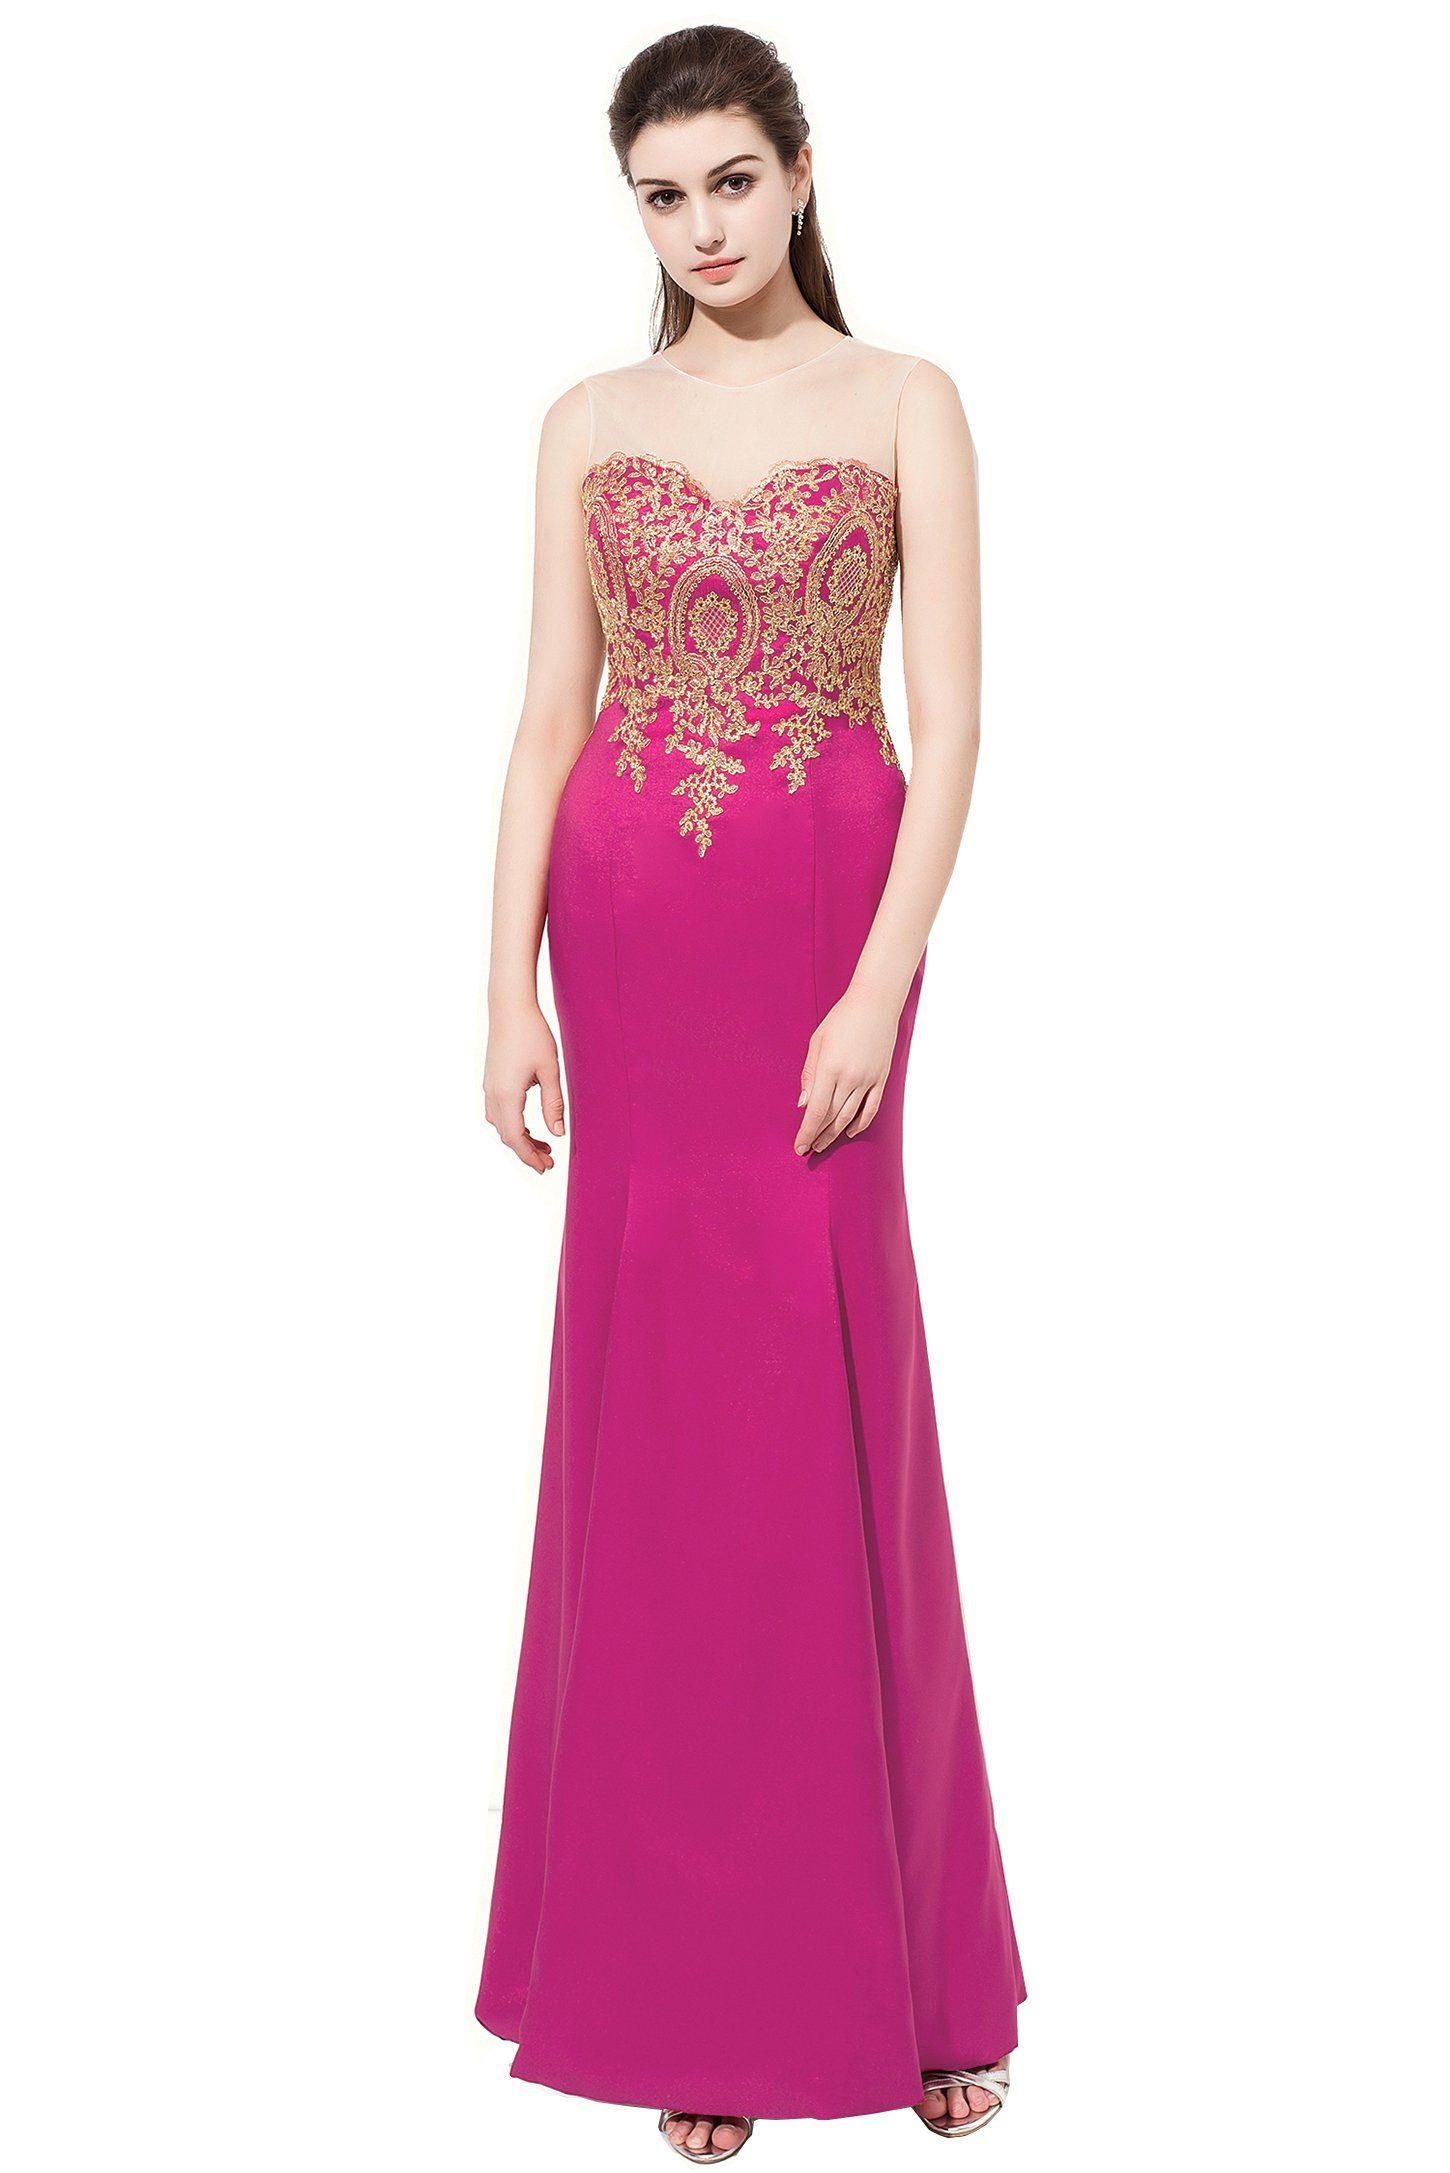 Yinyyinhs Women\'s Vintage Mermaid Prom Long Evening Dresses Size 18 ...